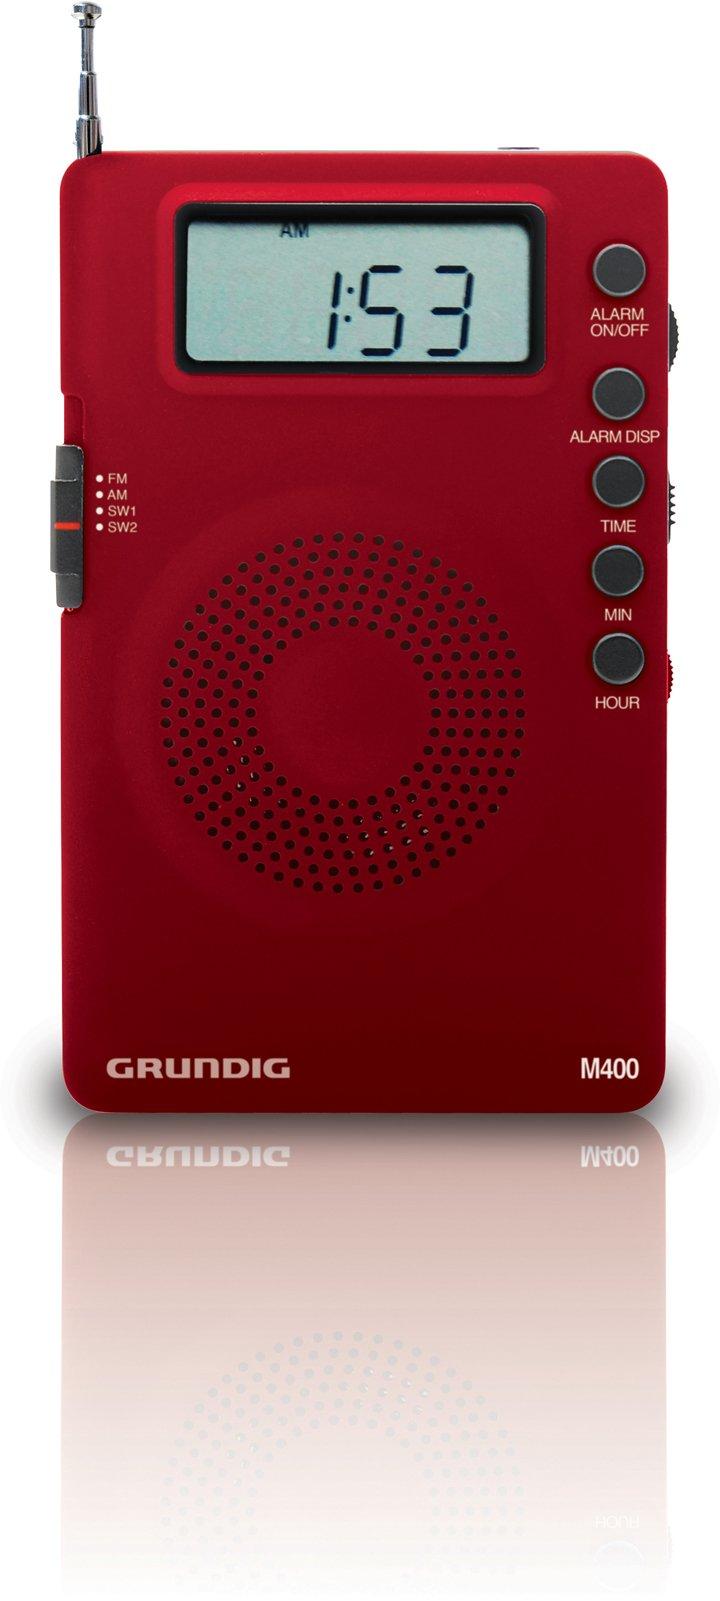 Eton Grundig M400 Super Compact – Goes Everywhere - AM/FM/Shortwave Digital Radio - Red (NGM400R)